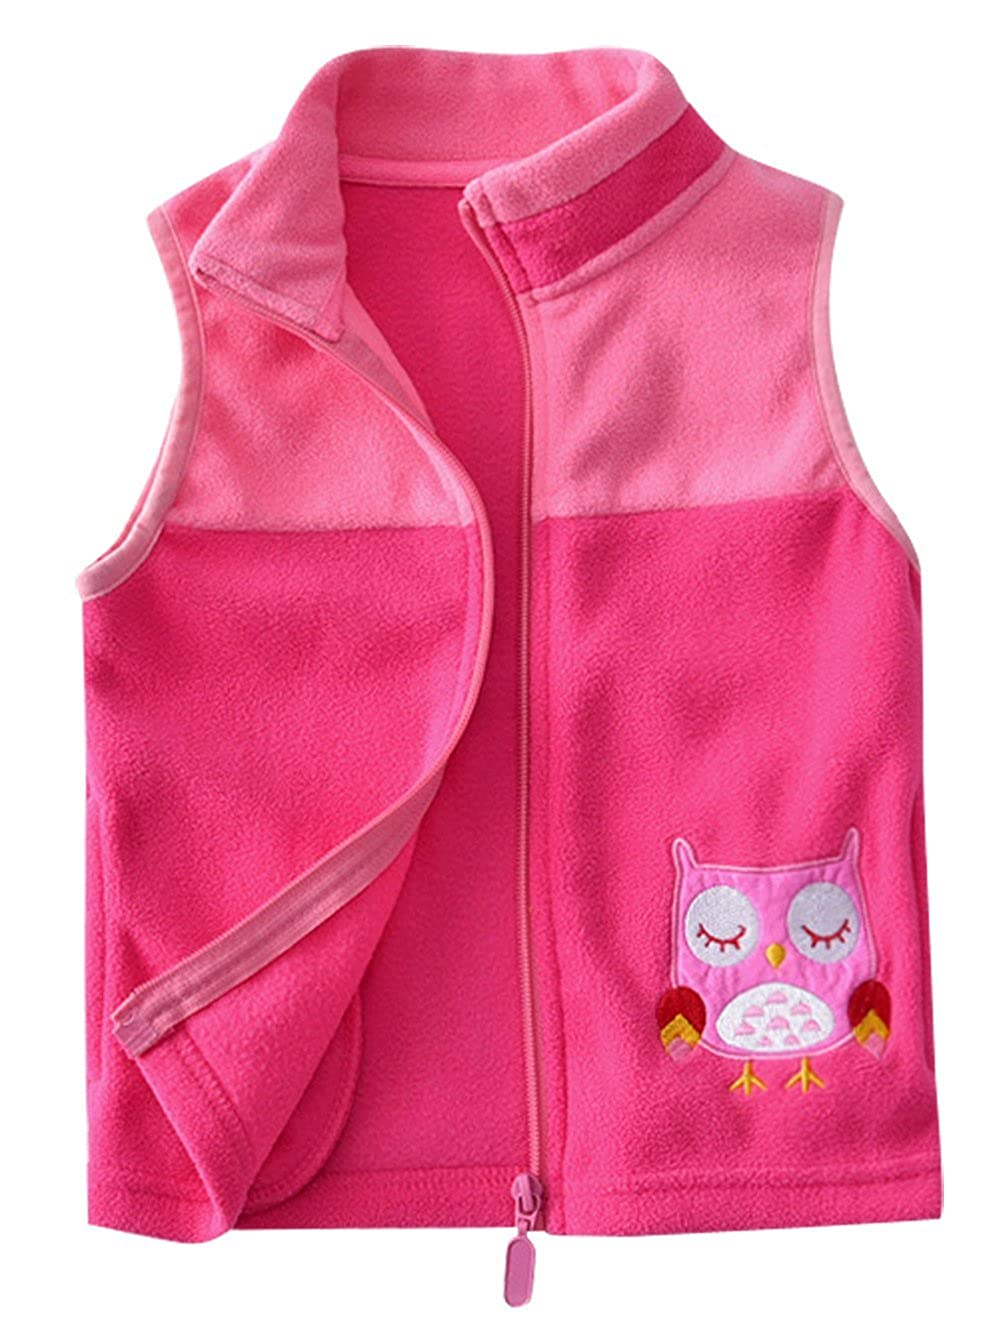 Happy Cherry Girls Cartoon Vest Polar Fleece Soft Winter Warm Zipper Up Pocket Waistcoat